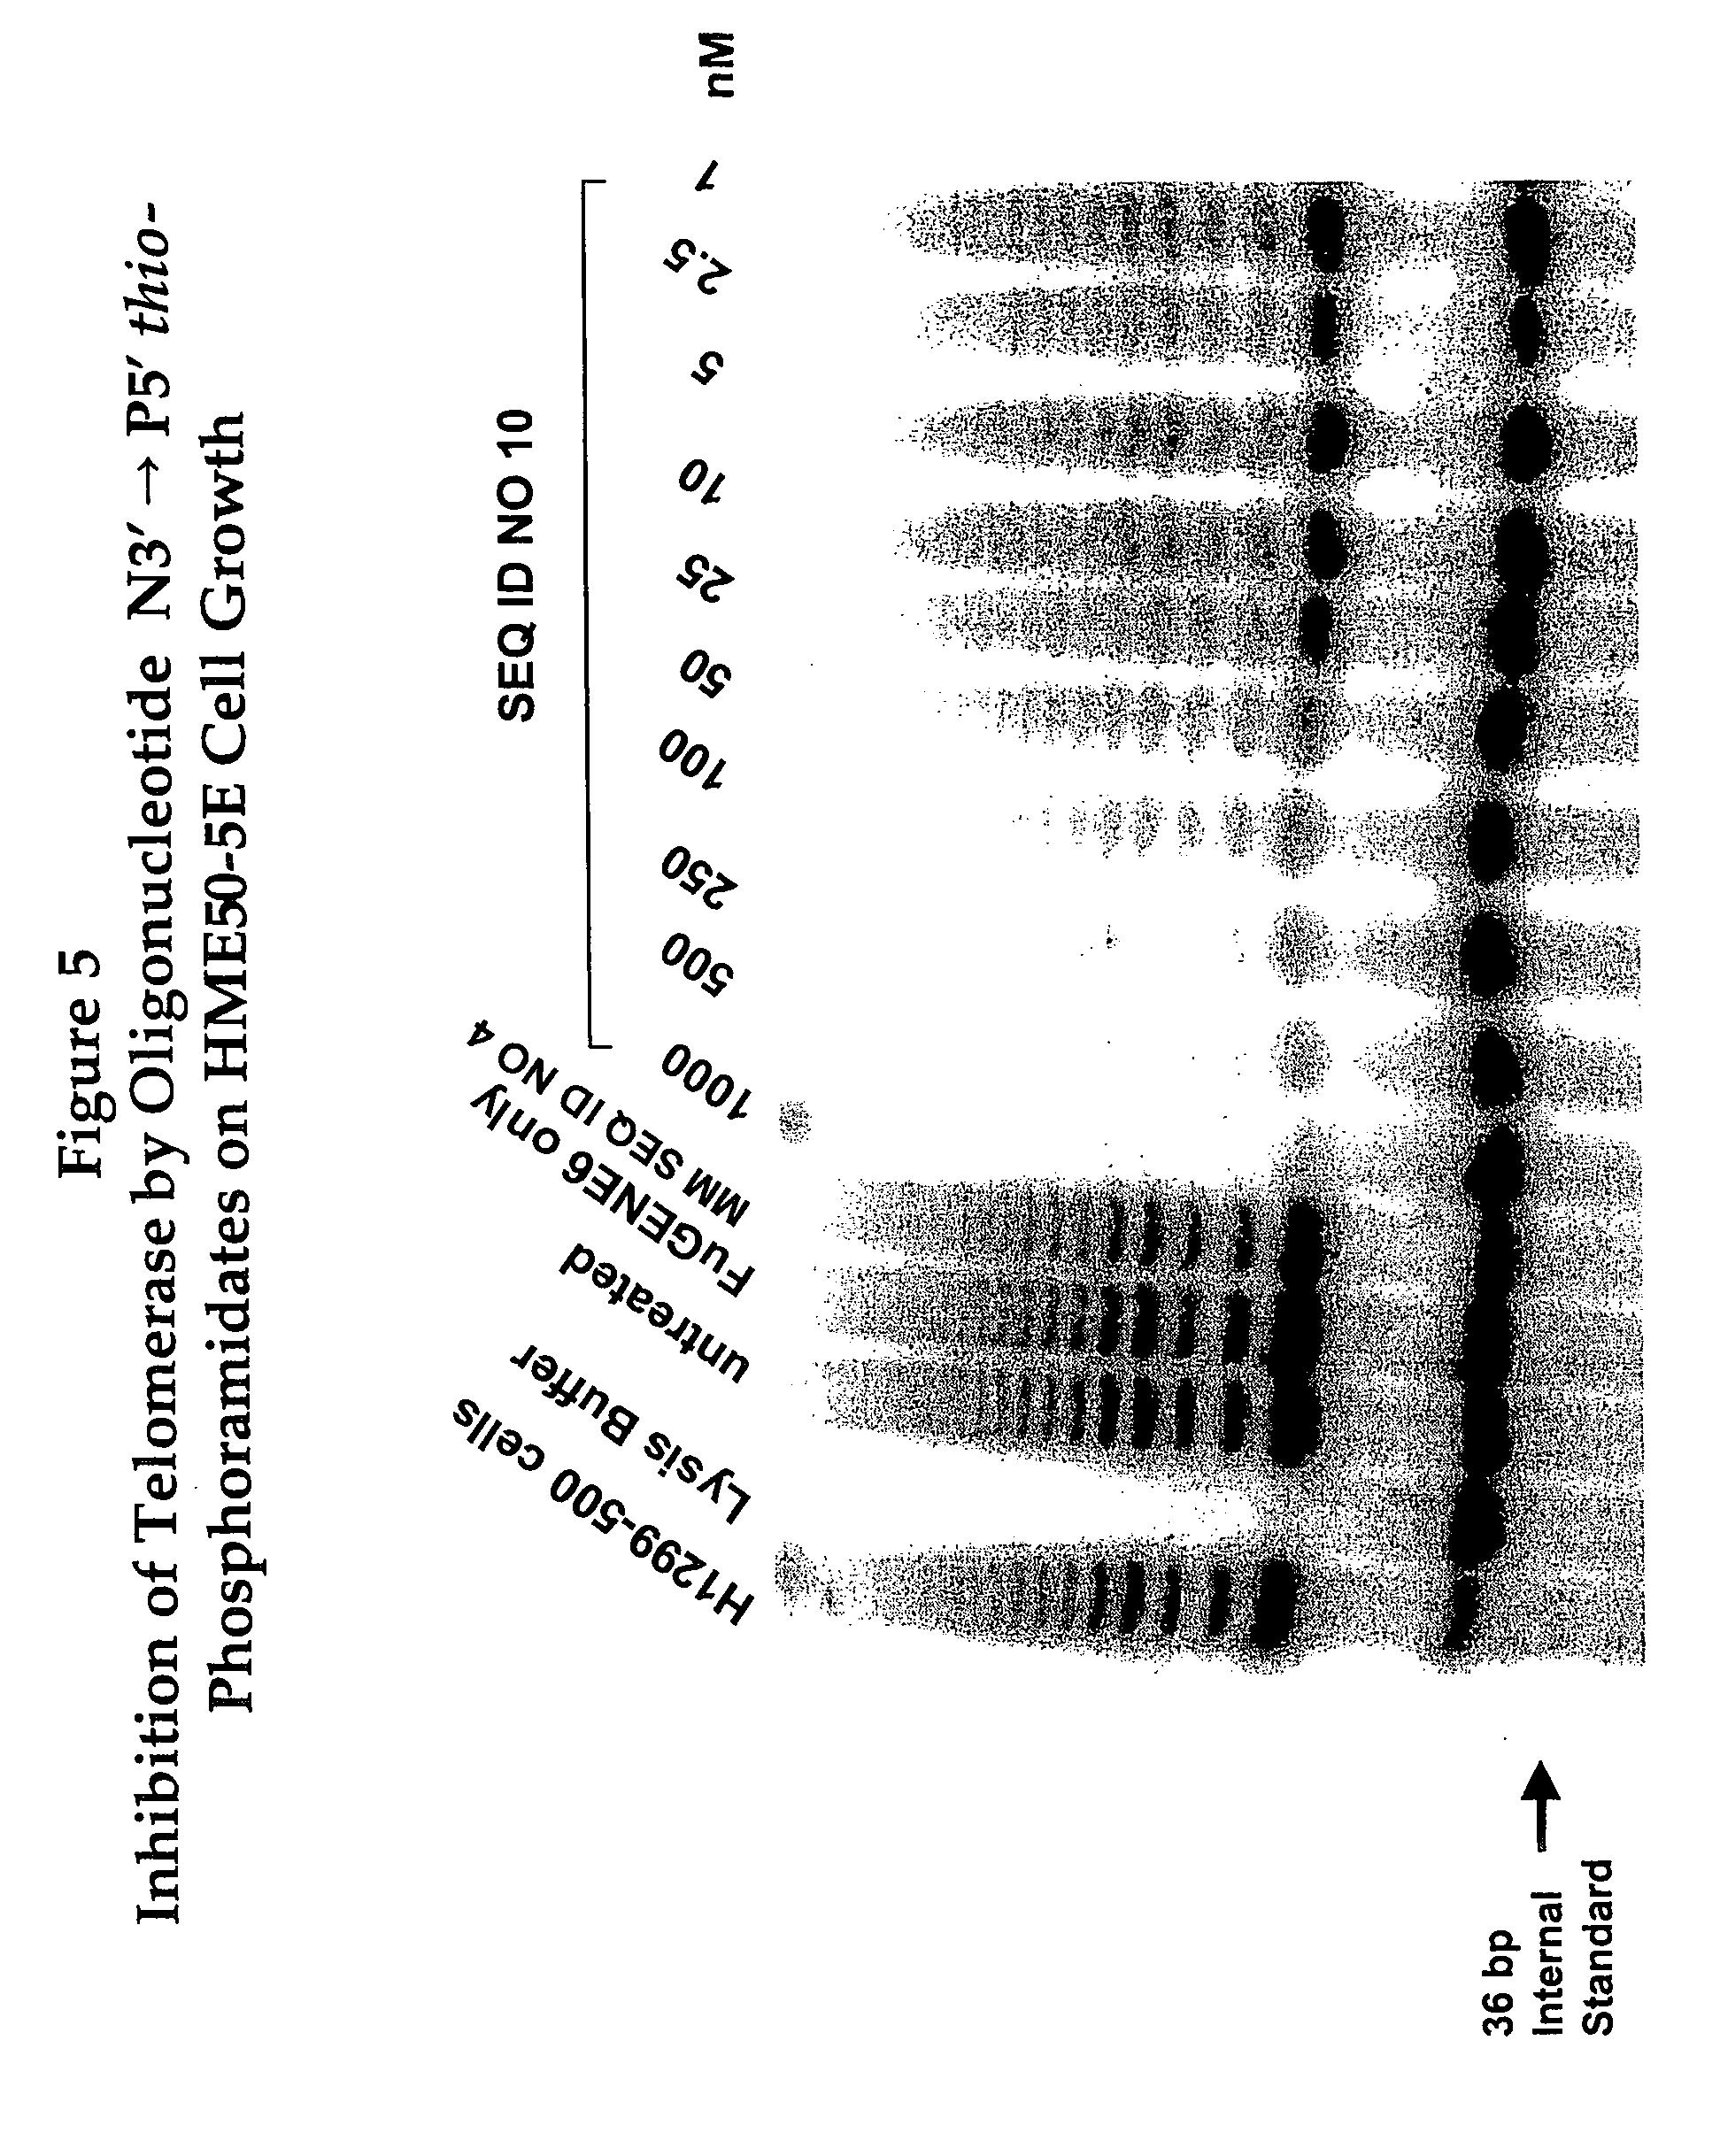 US20050049408A1 - Oligonucleotide N3'->P5